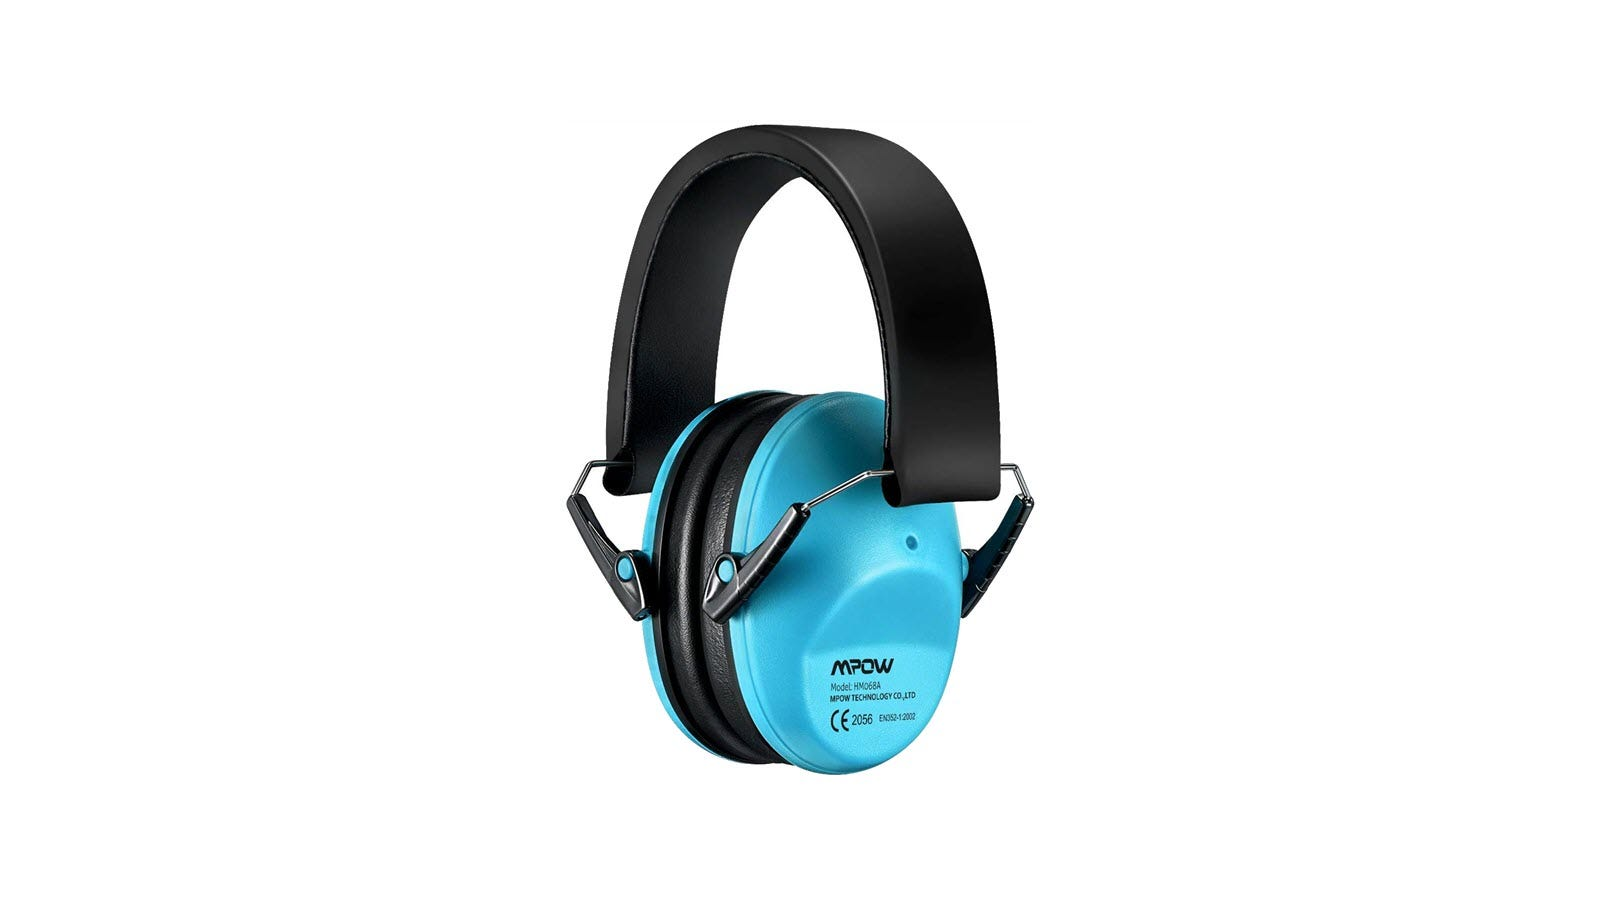 A blue set of Mpow kids hearing protection earmuffs.